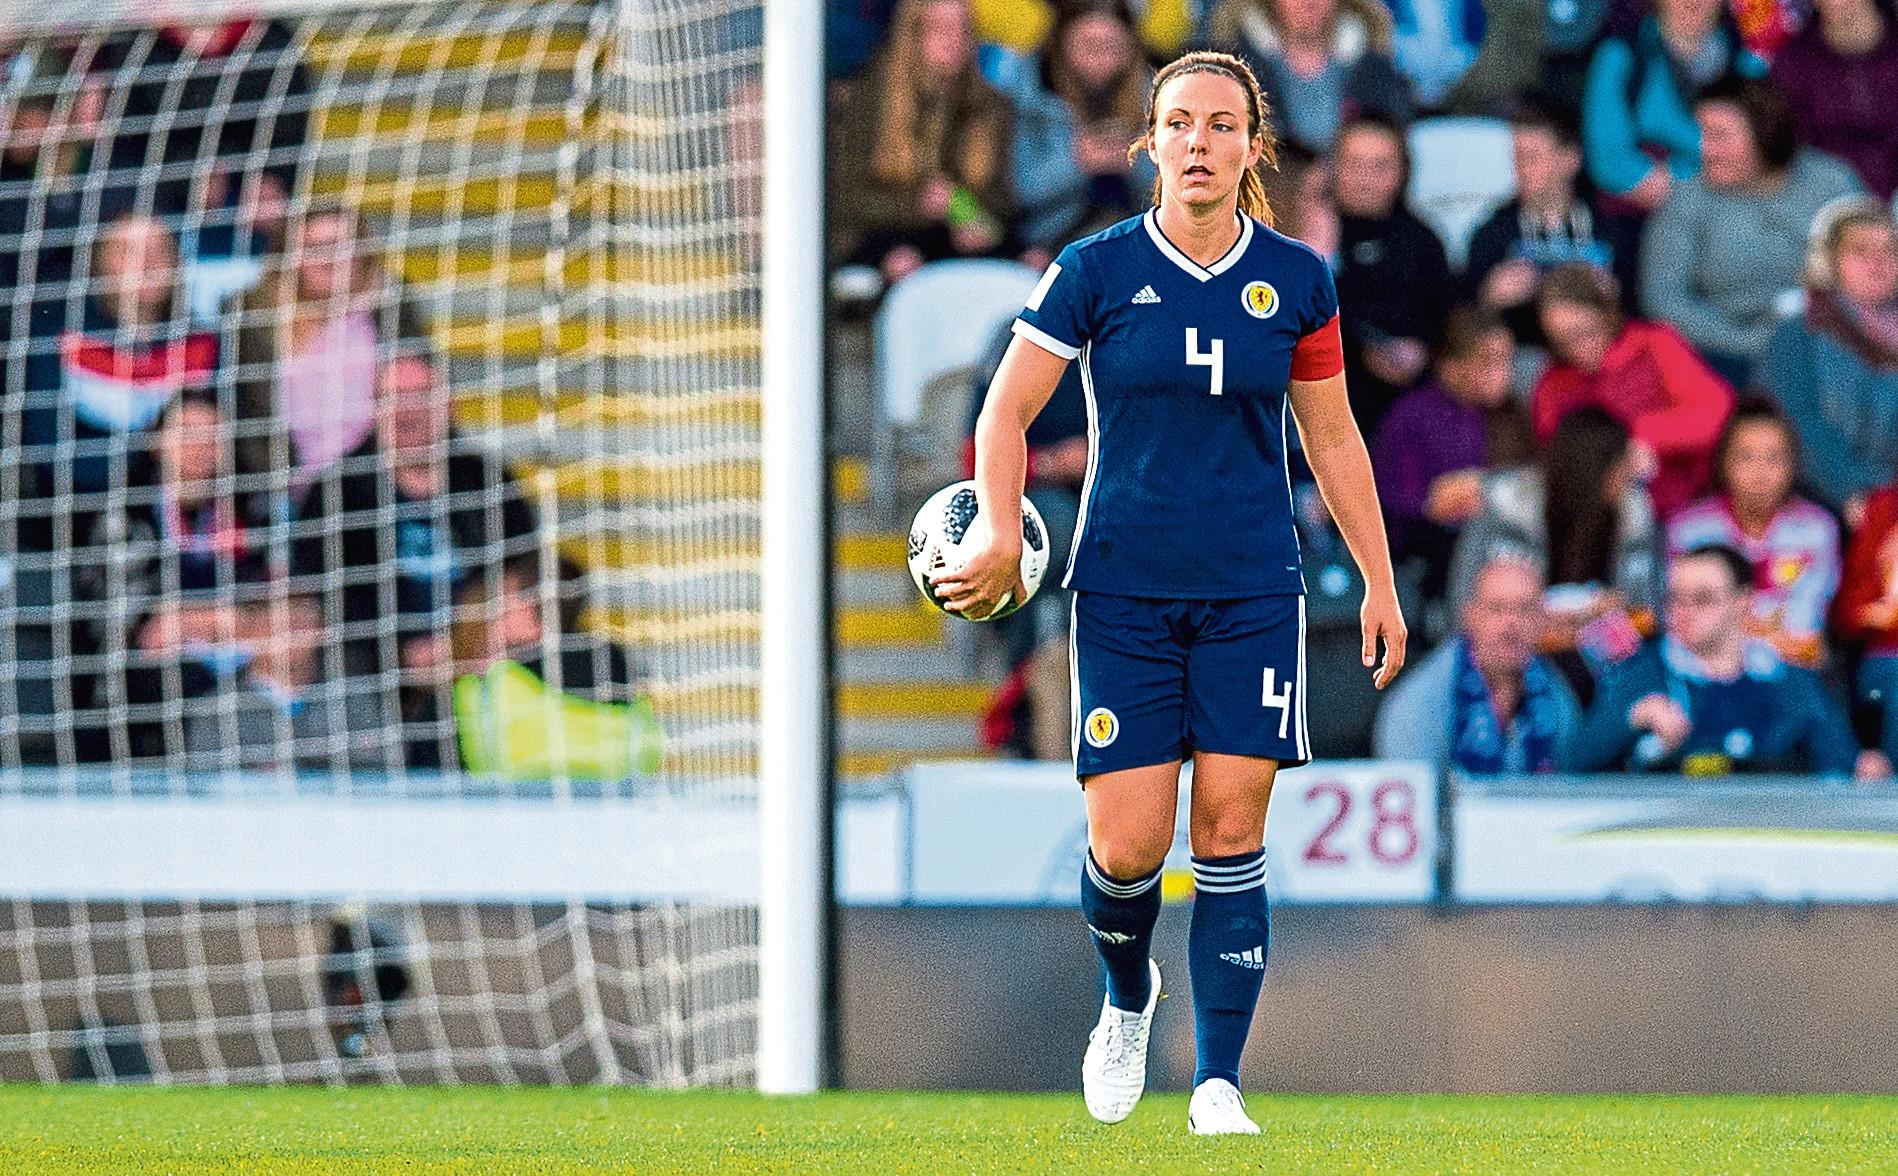 30/08/18 FIFA WOMENS 2019 WORLD CUP QUALIFIER    SCOTLAND WOMEN V SWITZERLAND WOMEN   THE SIMPLE DIGITAL ARENA - PAISLEY   Rachel Corsie in action for Scotland